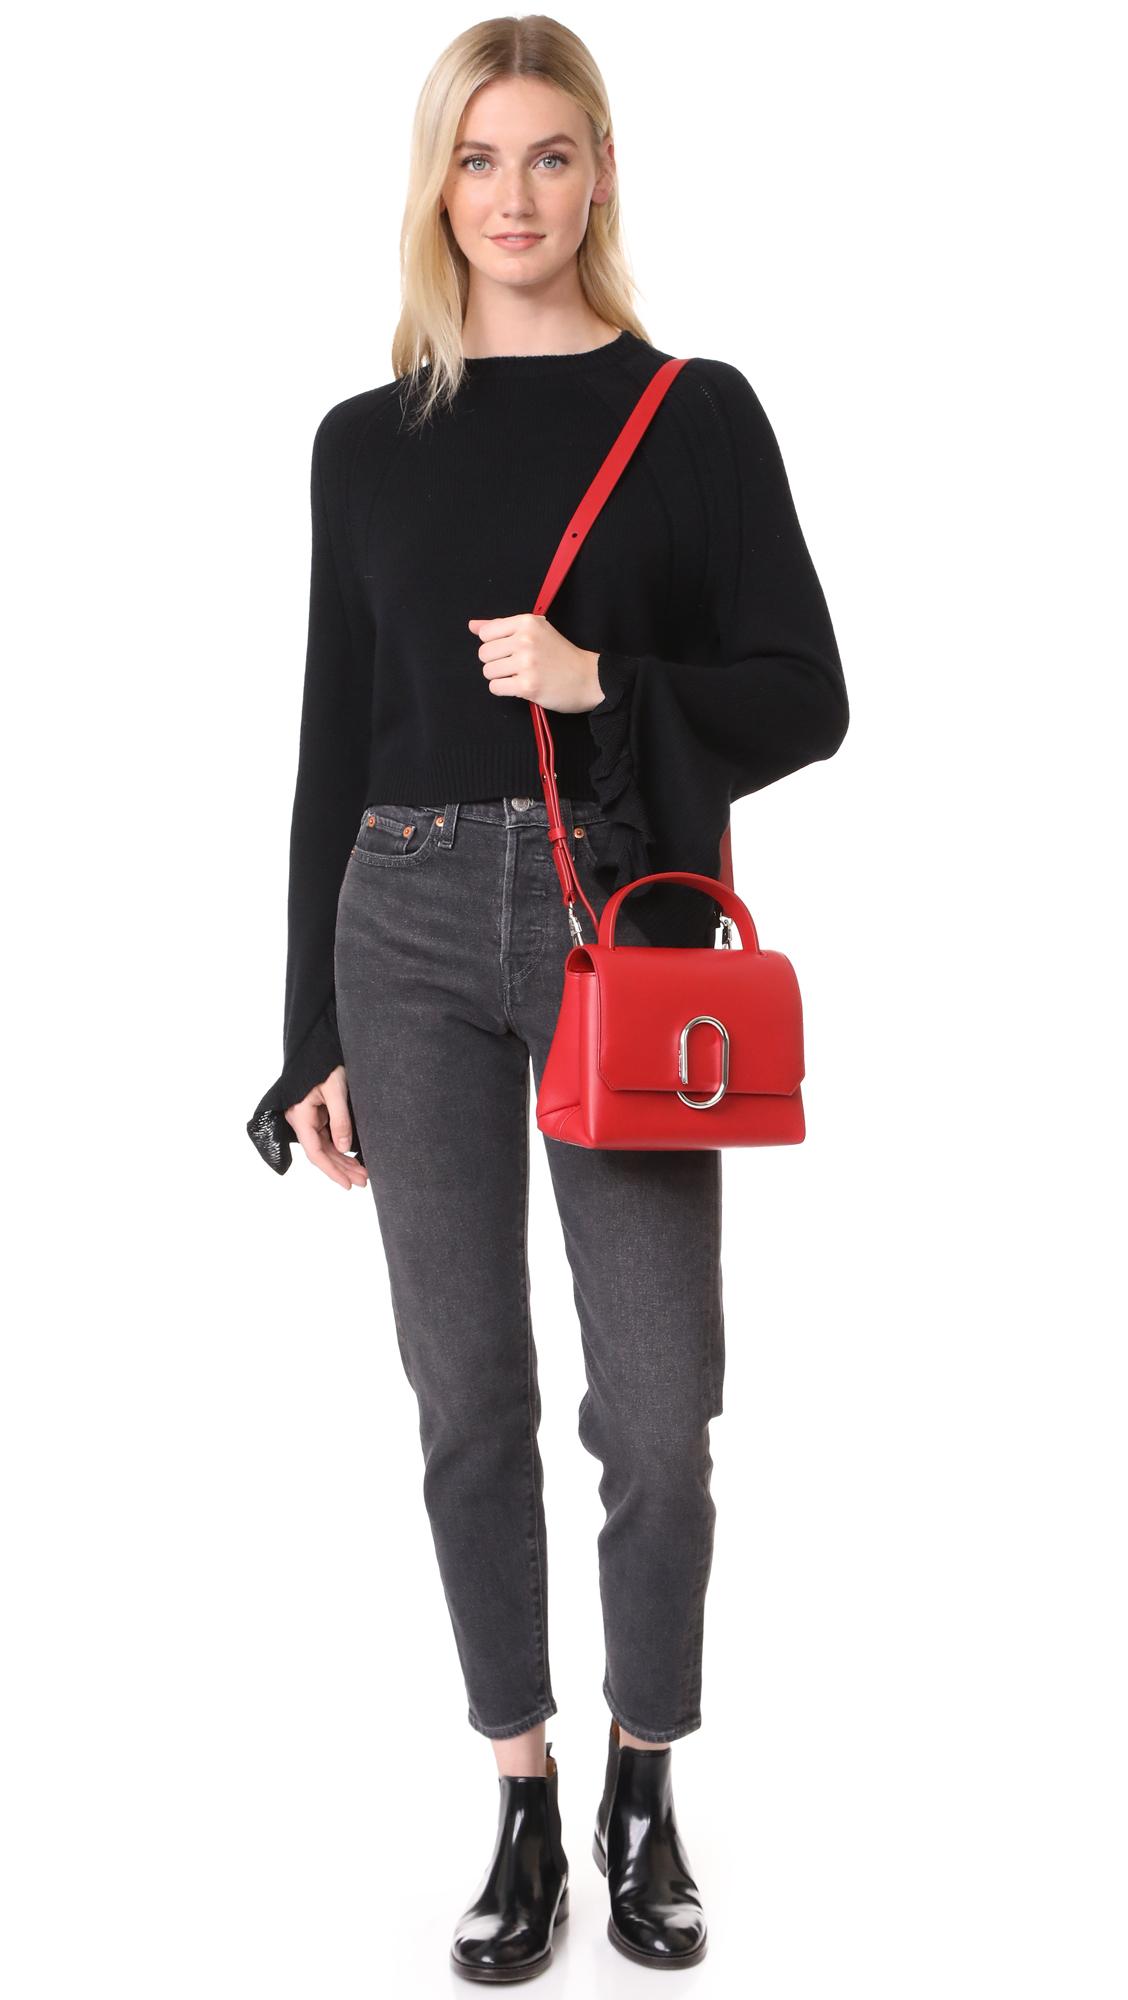 Alix mini satchel - Black 3.1 Phillip Lim KmPVUCL